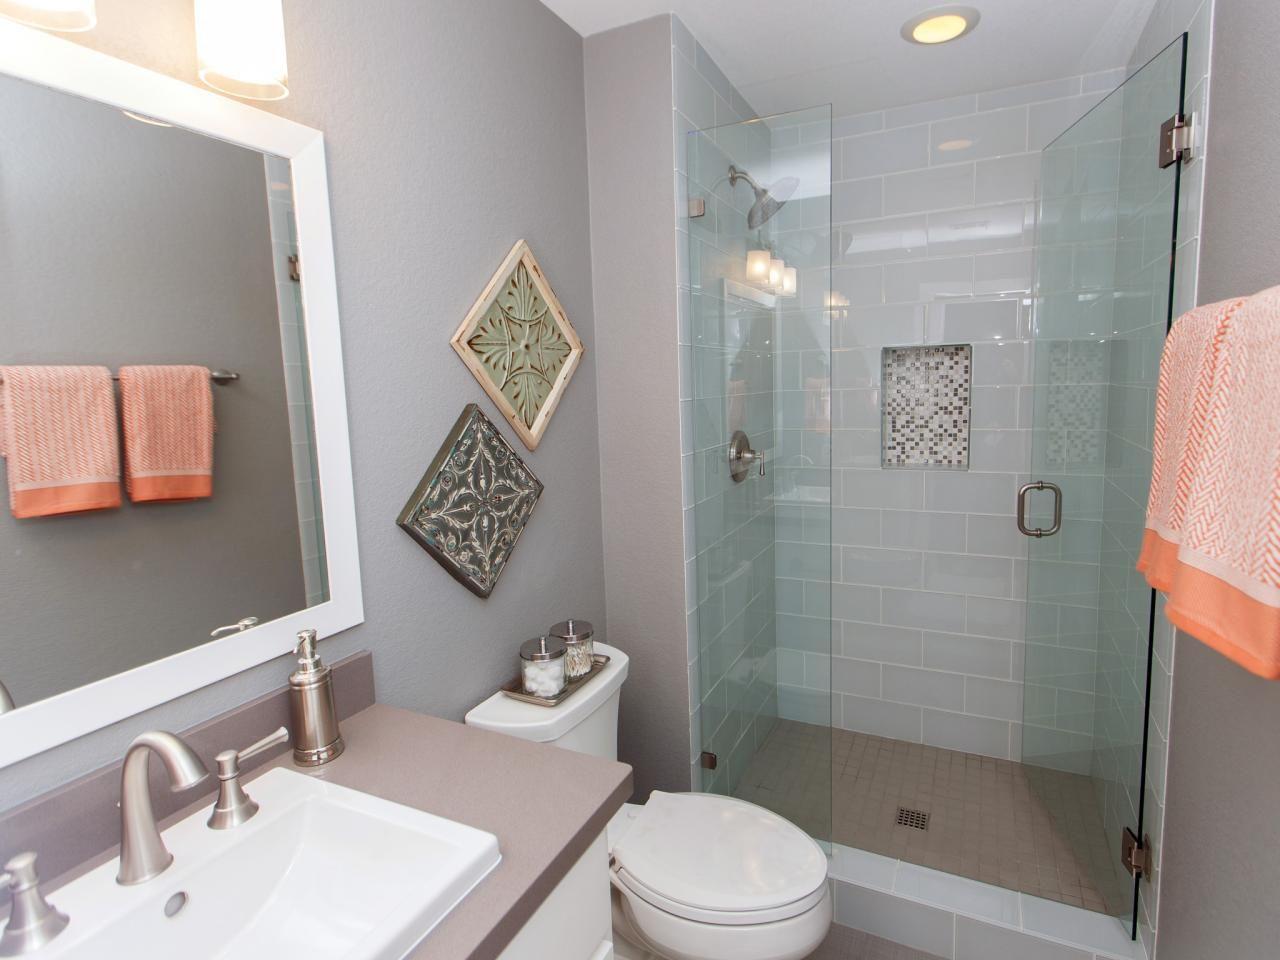 Fixer Upper S Best Bathroom Flips Hgtv S Fixer Upper With Chip And Joanna Gaines Hgtv Small Bathroom Makeover Fixer Upper Bathroom Joanna Gaines Bathroom